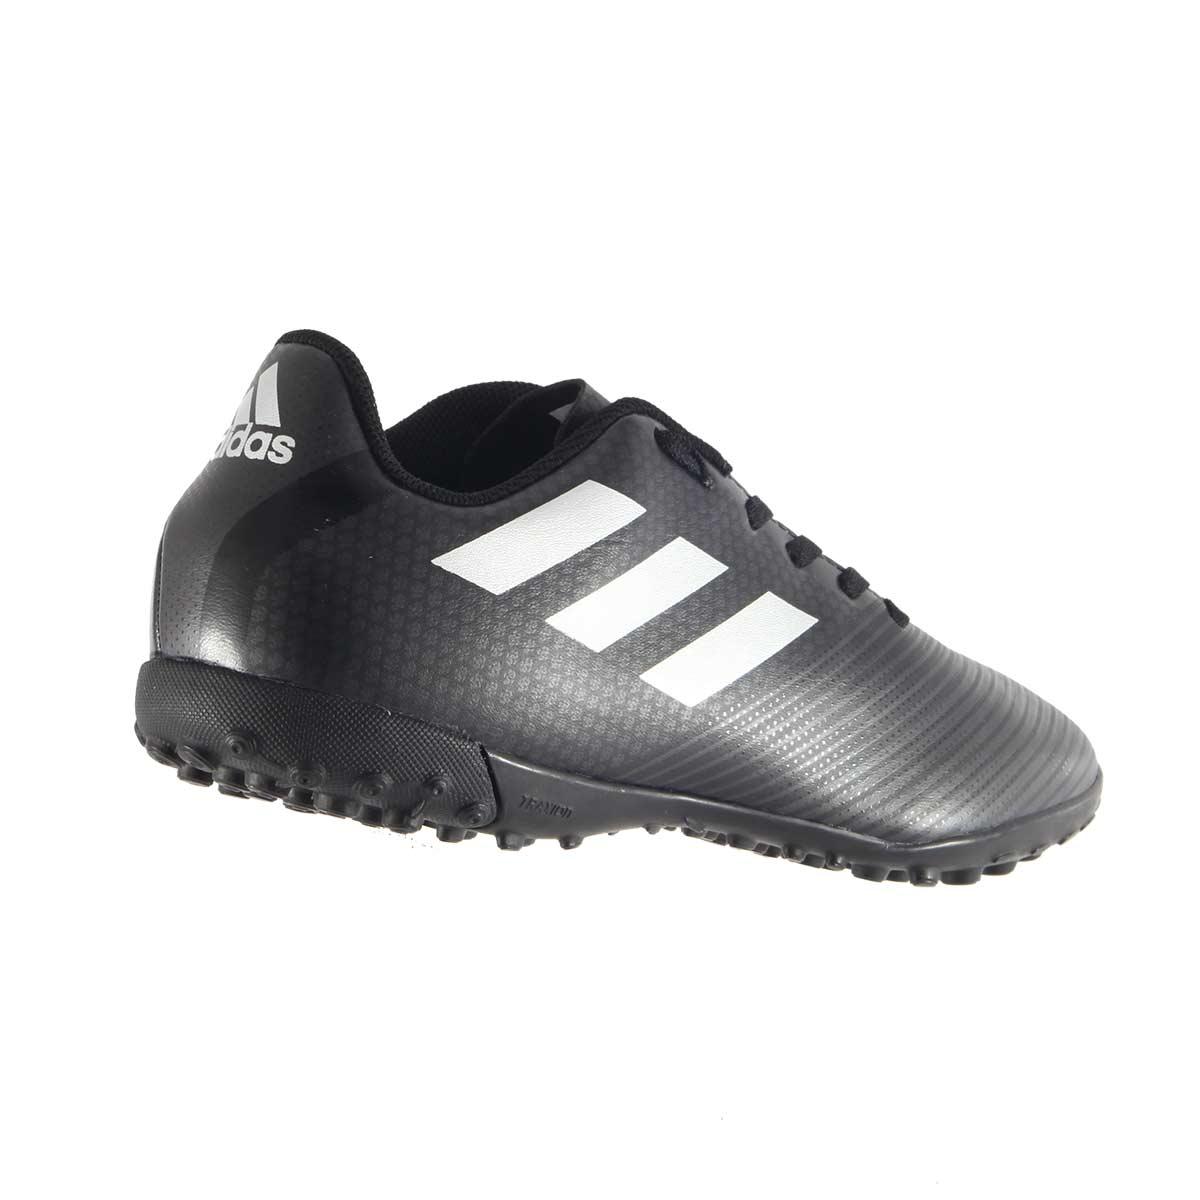 Chuteira Adidas Artilheira 17 TF Society Masculina H68438